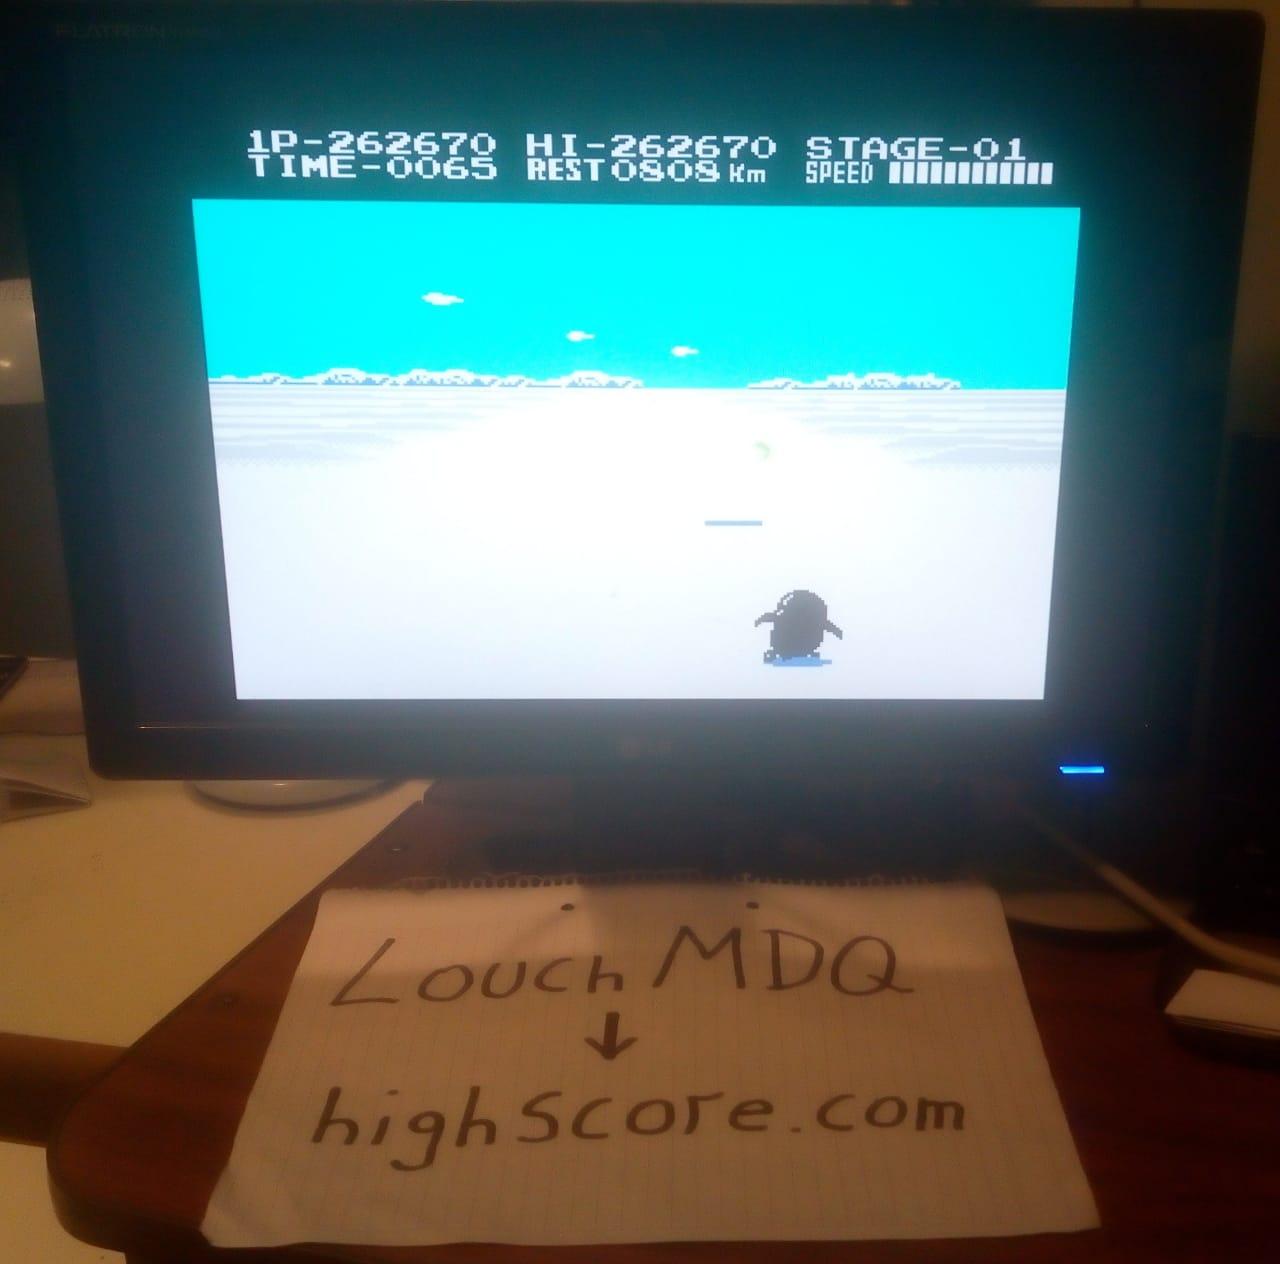 LouchMDQ: Antarctic Adventure: Level 1 Start (NES/Famicom Emulated) 262,670 points on 2020-06-20 17:11:00